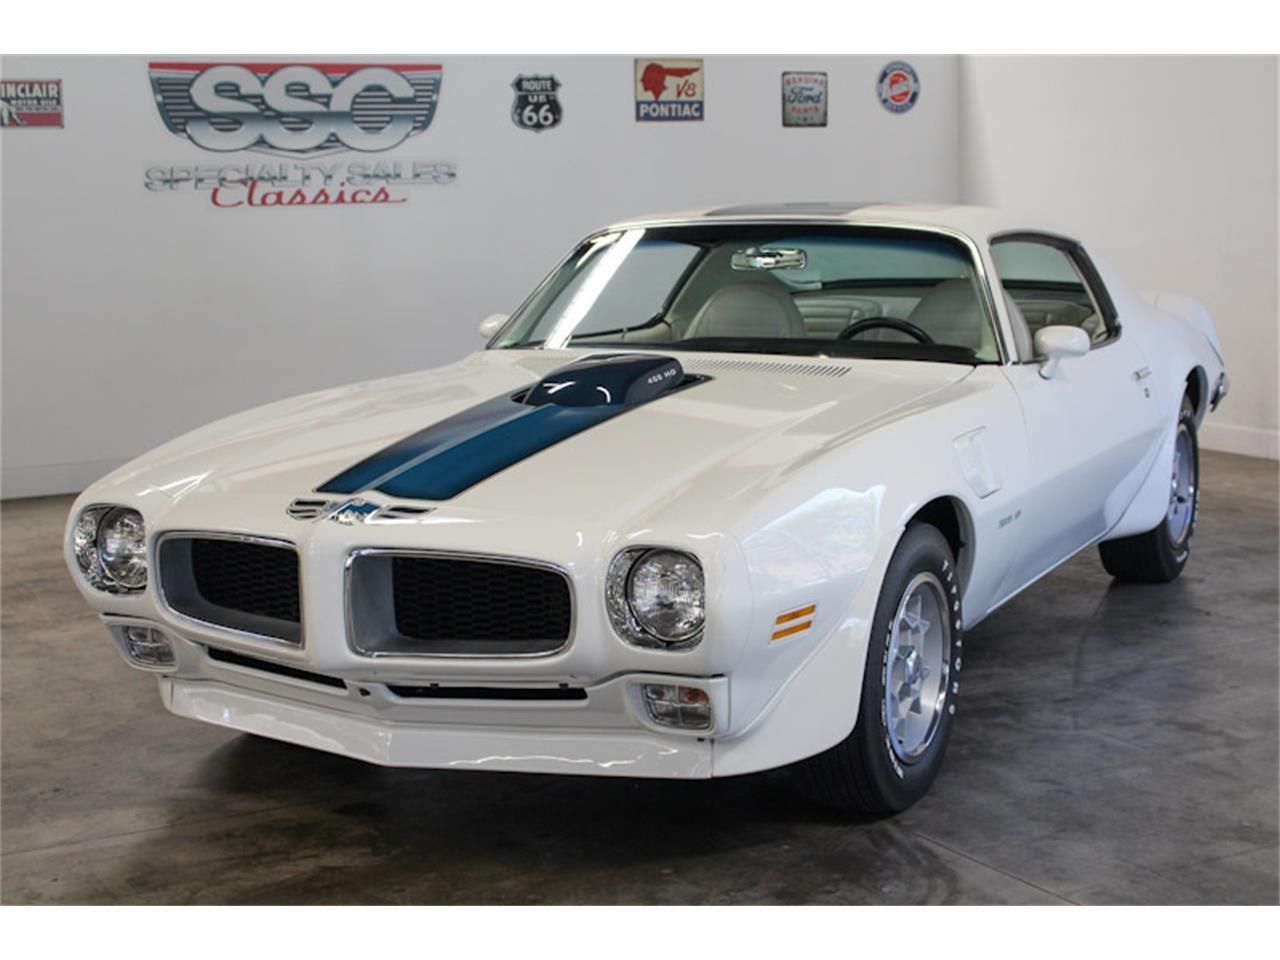 Large Picture of Classic 1972 Pontiac Firebird located in Fairfield California - $129,990.00 - QQZ8